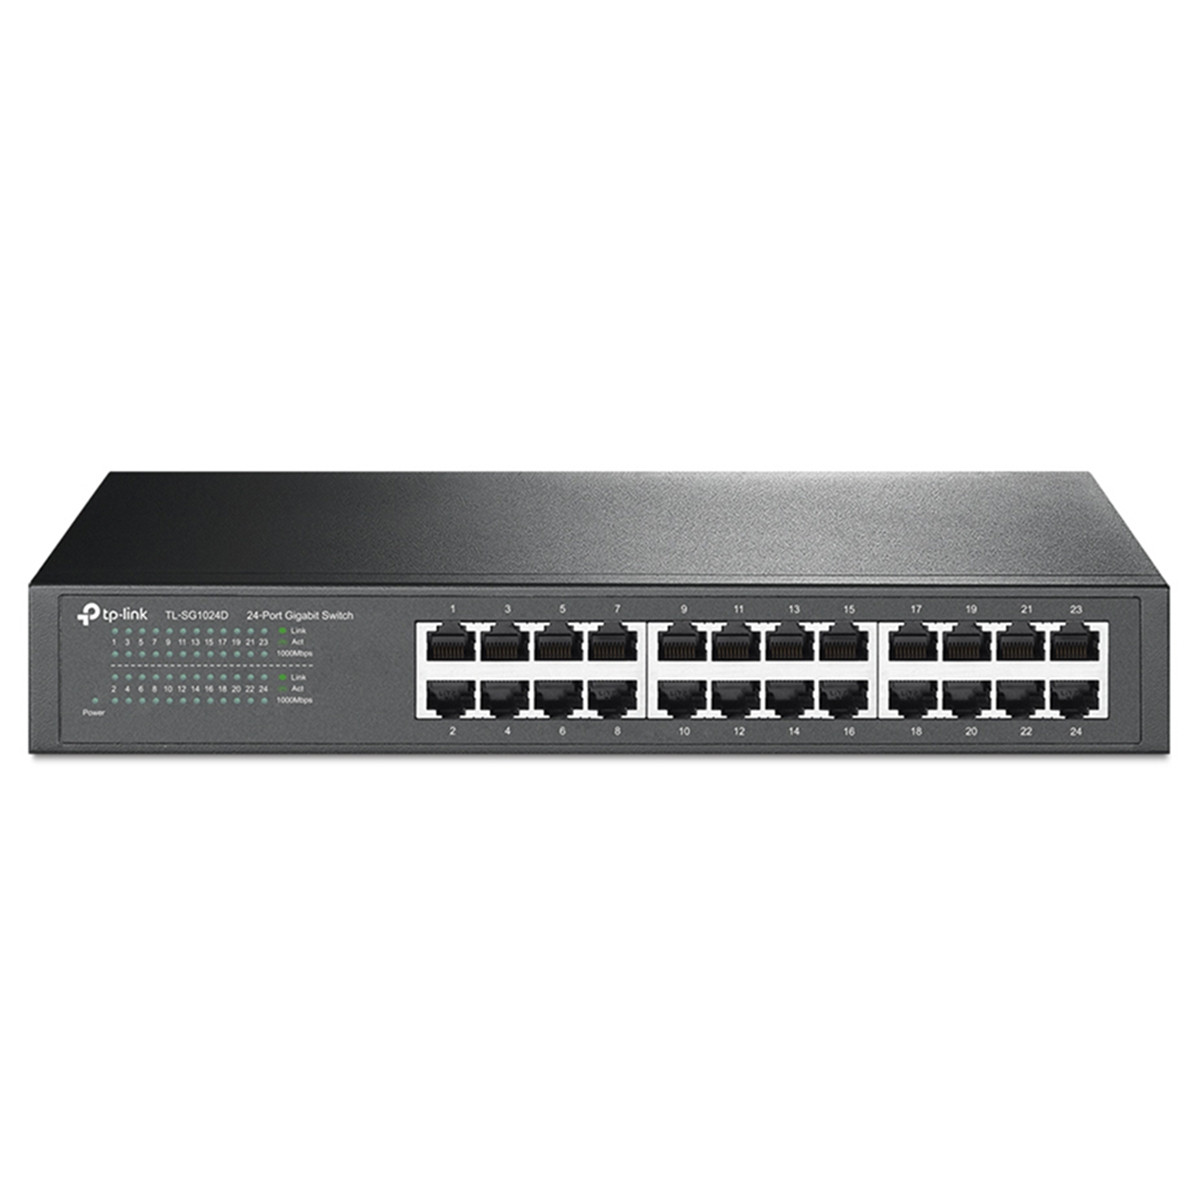 Switch TP-LINK TL-SG1024D 1000Mbps com 24 Portas